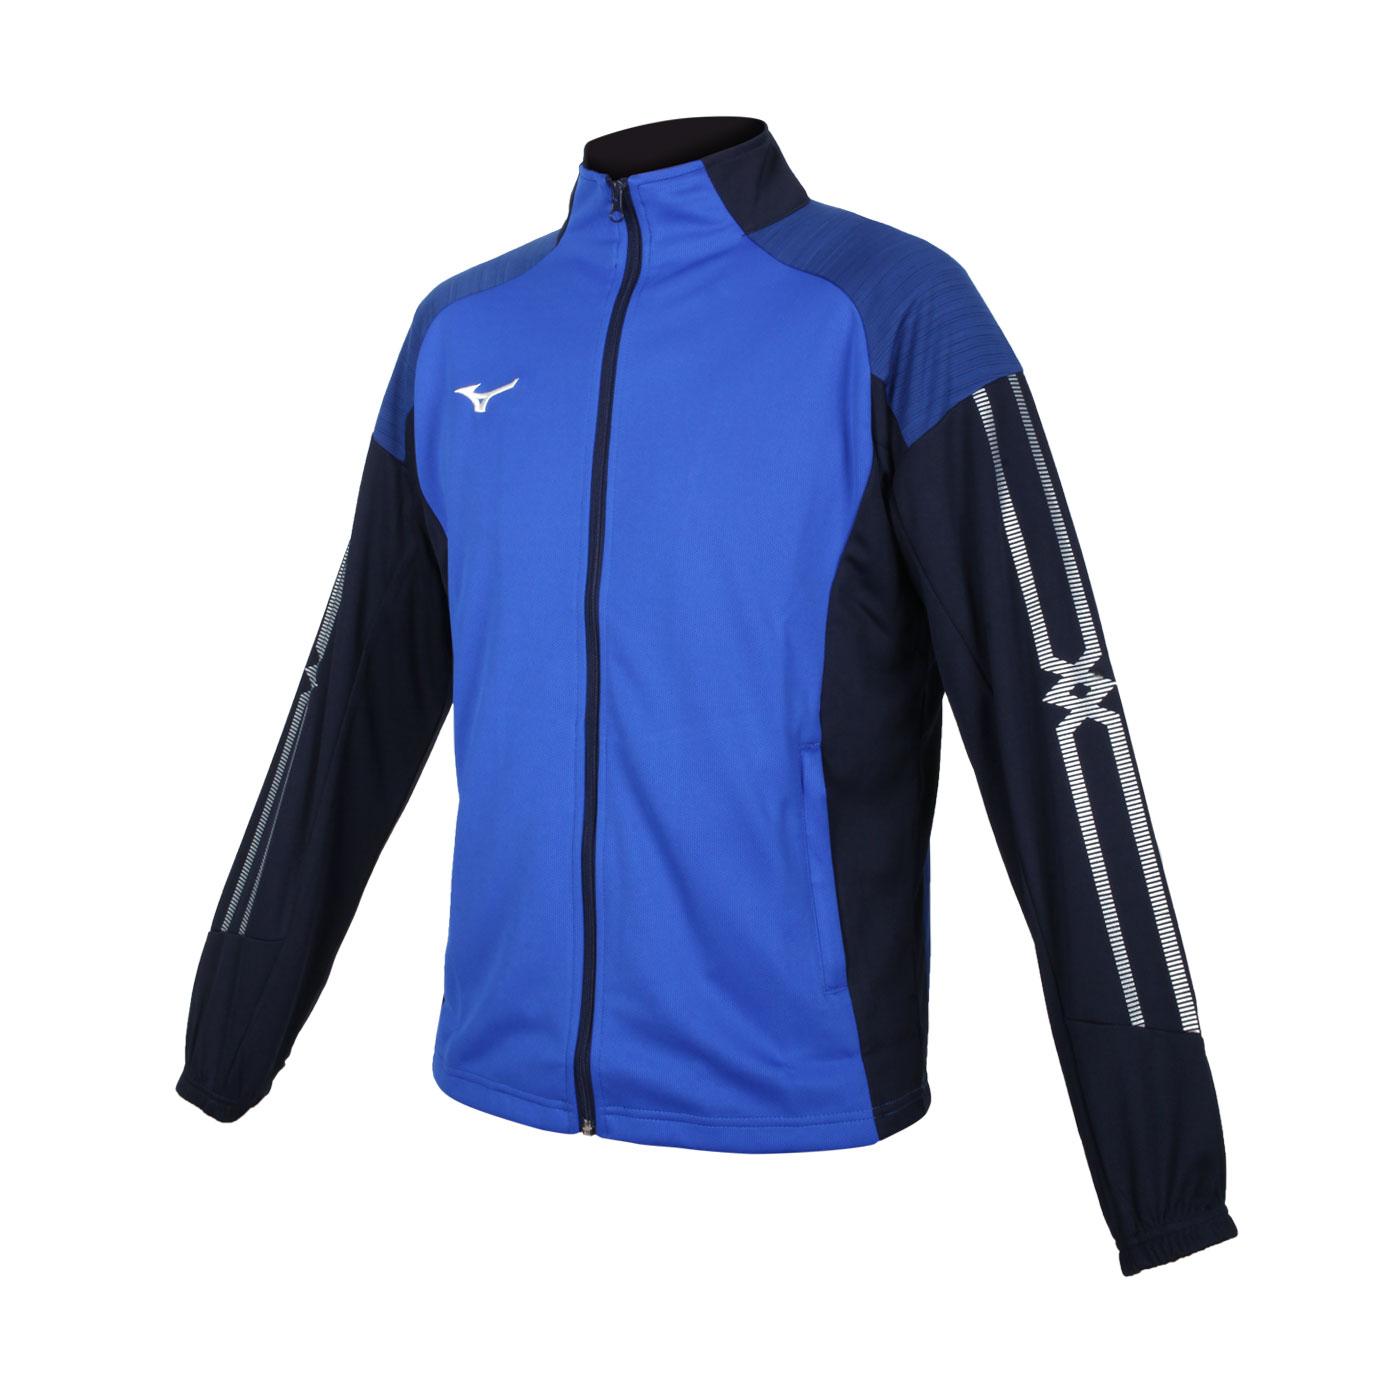 MIZUNO 男款針織外套 32TC153322 - 藍丈青白